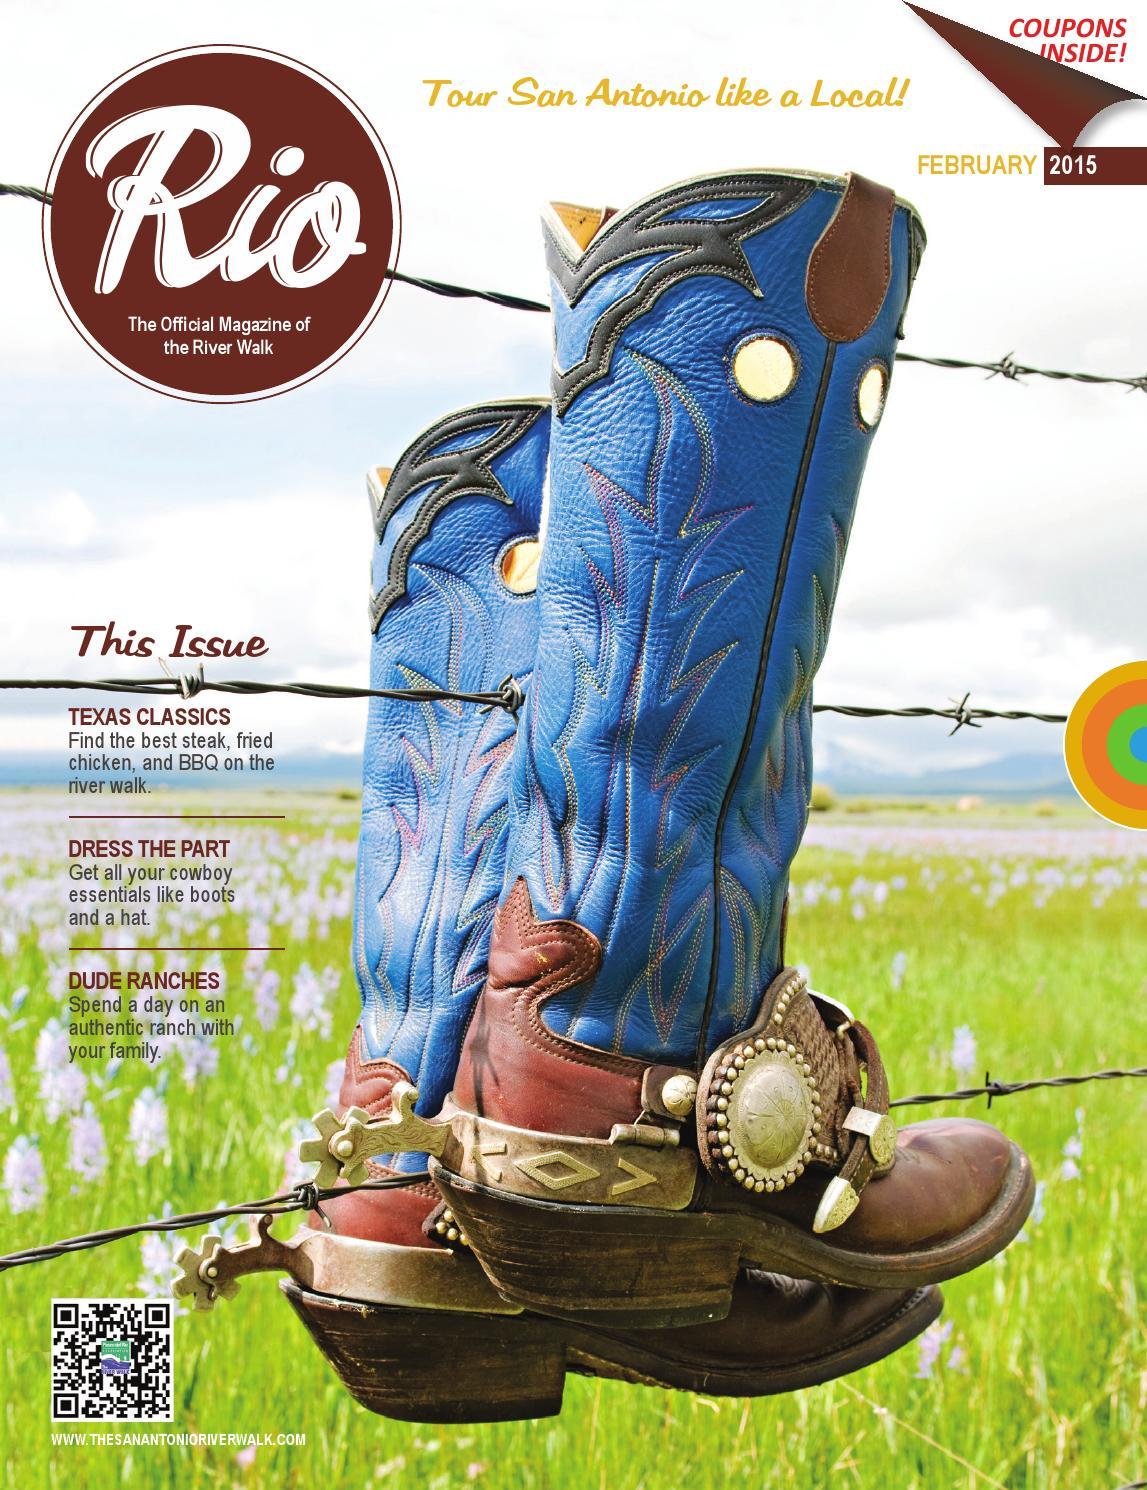 rio magazine february 2015 by traveling blender - issuu